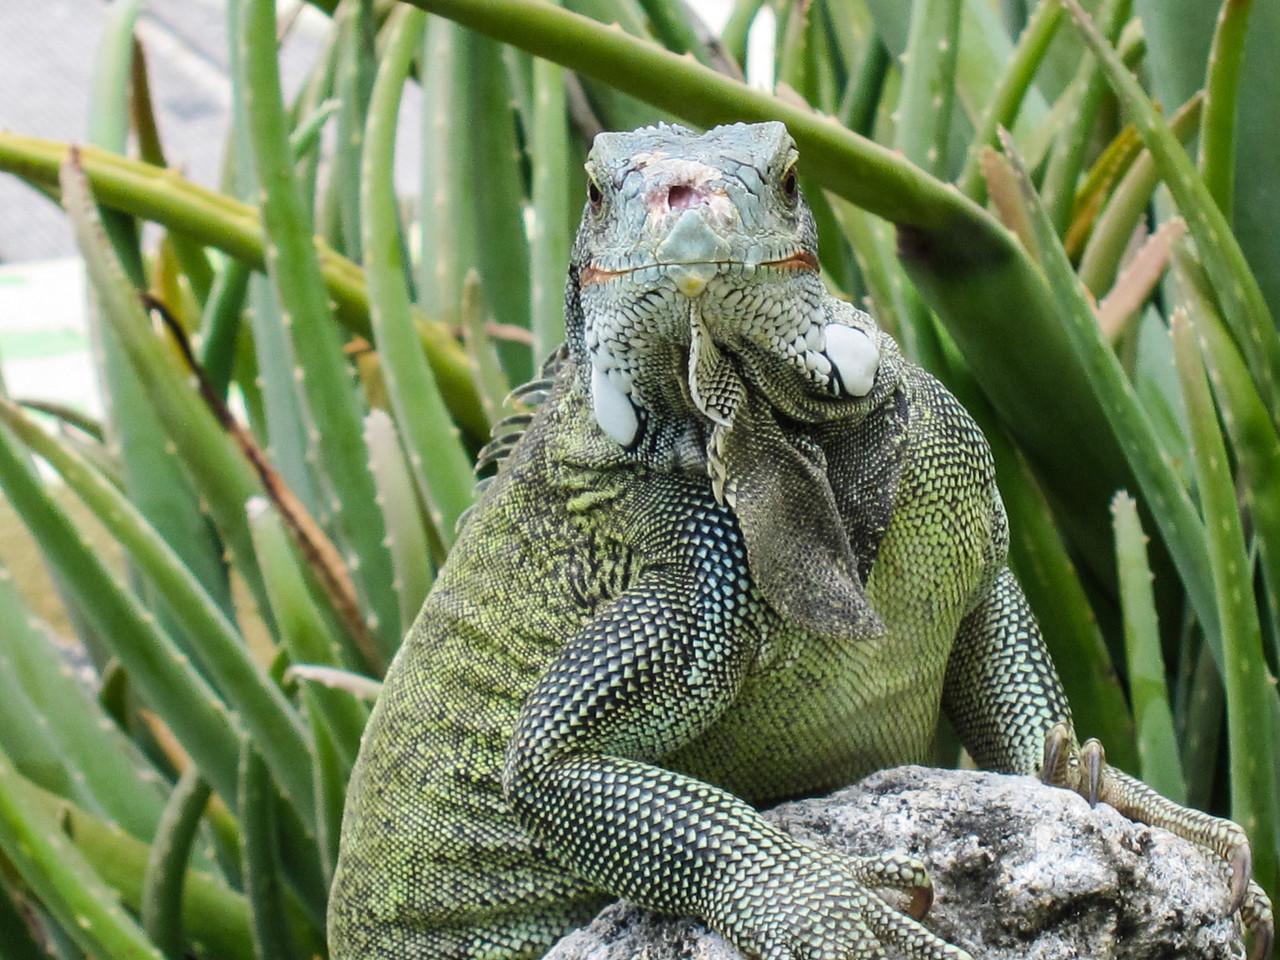 Large Iguana eyeballing me at Lions Dive Resort, Curaçao - February 2013